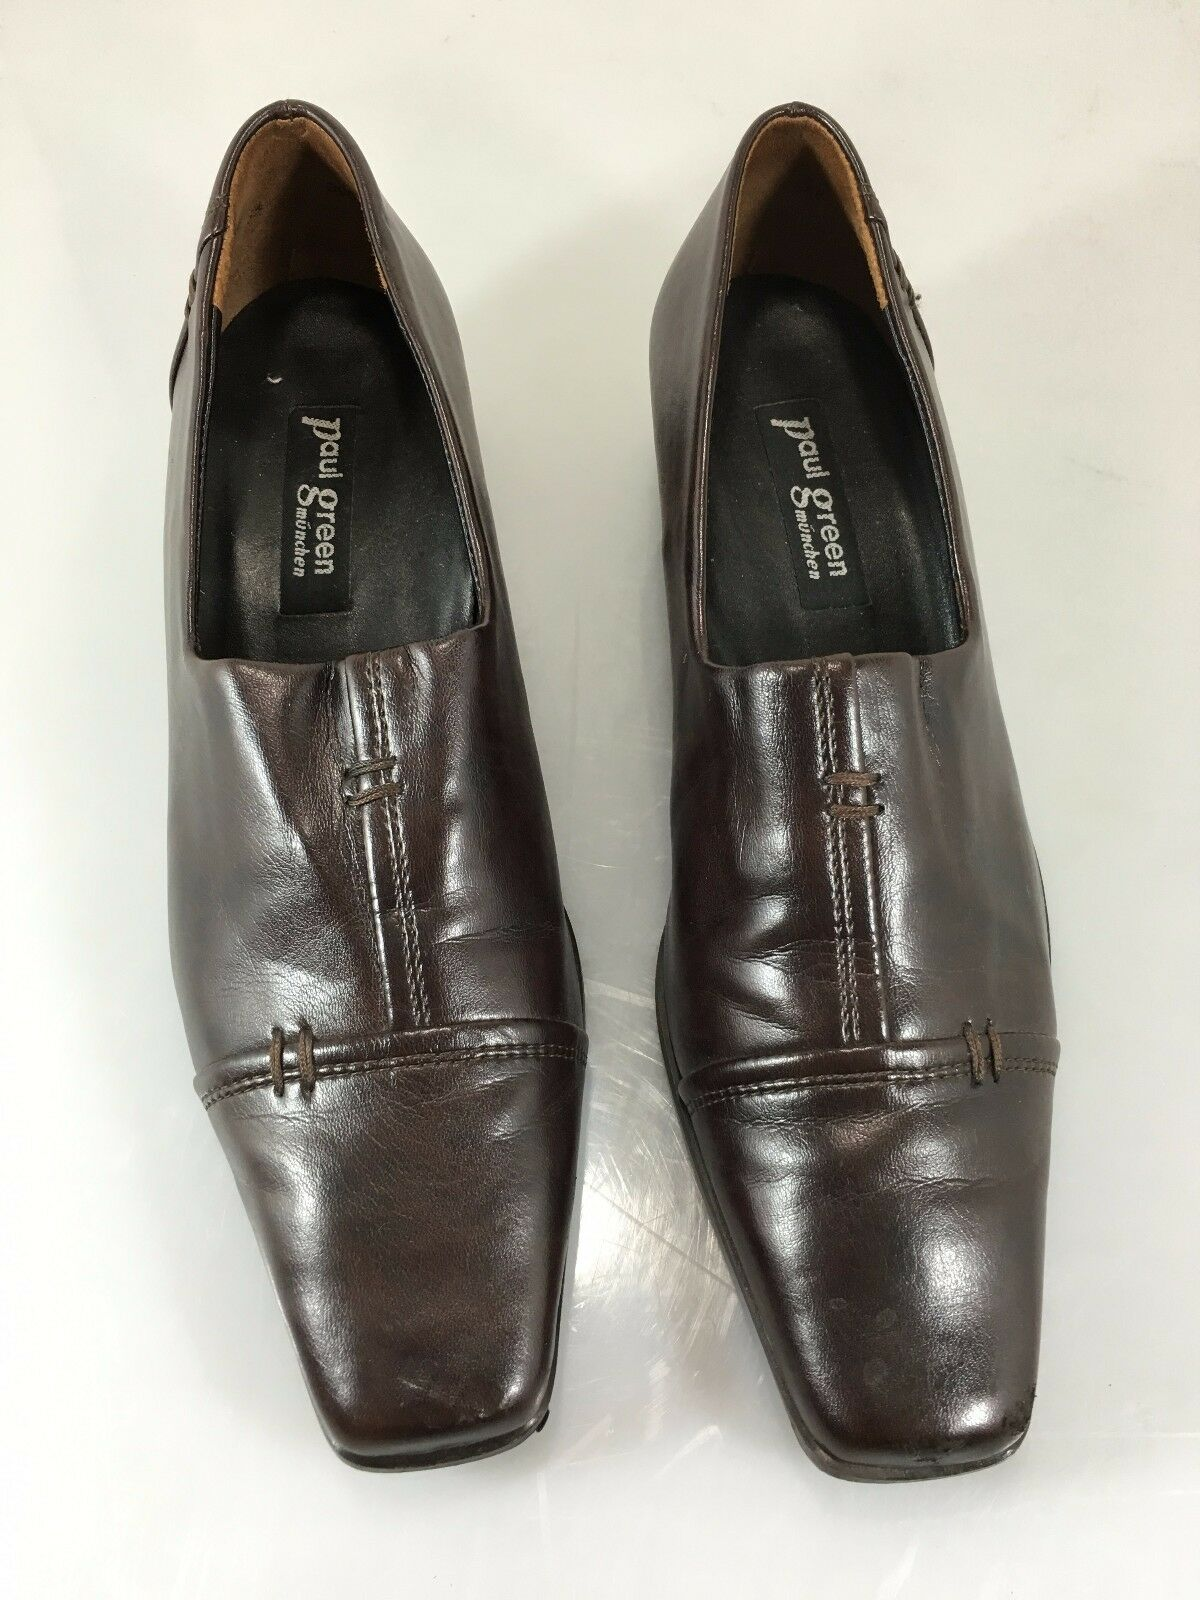 Paul verde 5 Munchen Donna 3.5 Austria 5 verde US Brown Leather Loafers Shoes cf8c67